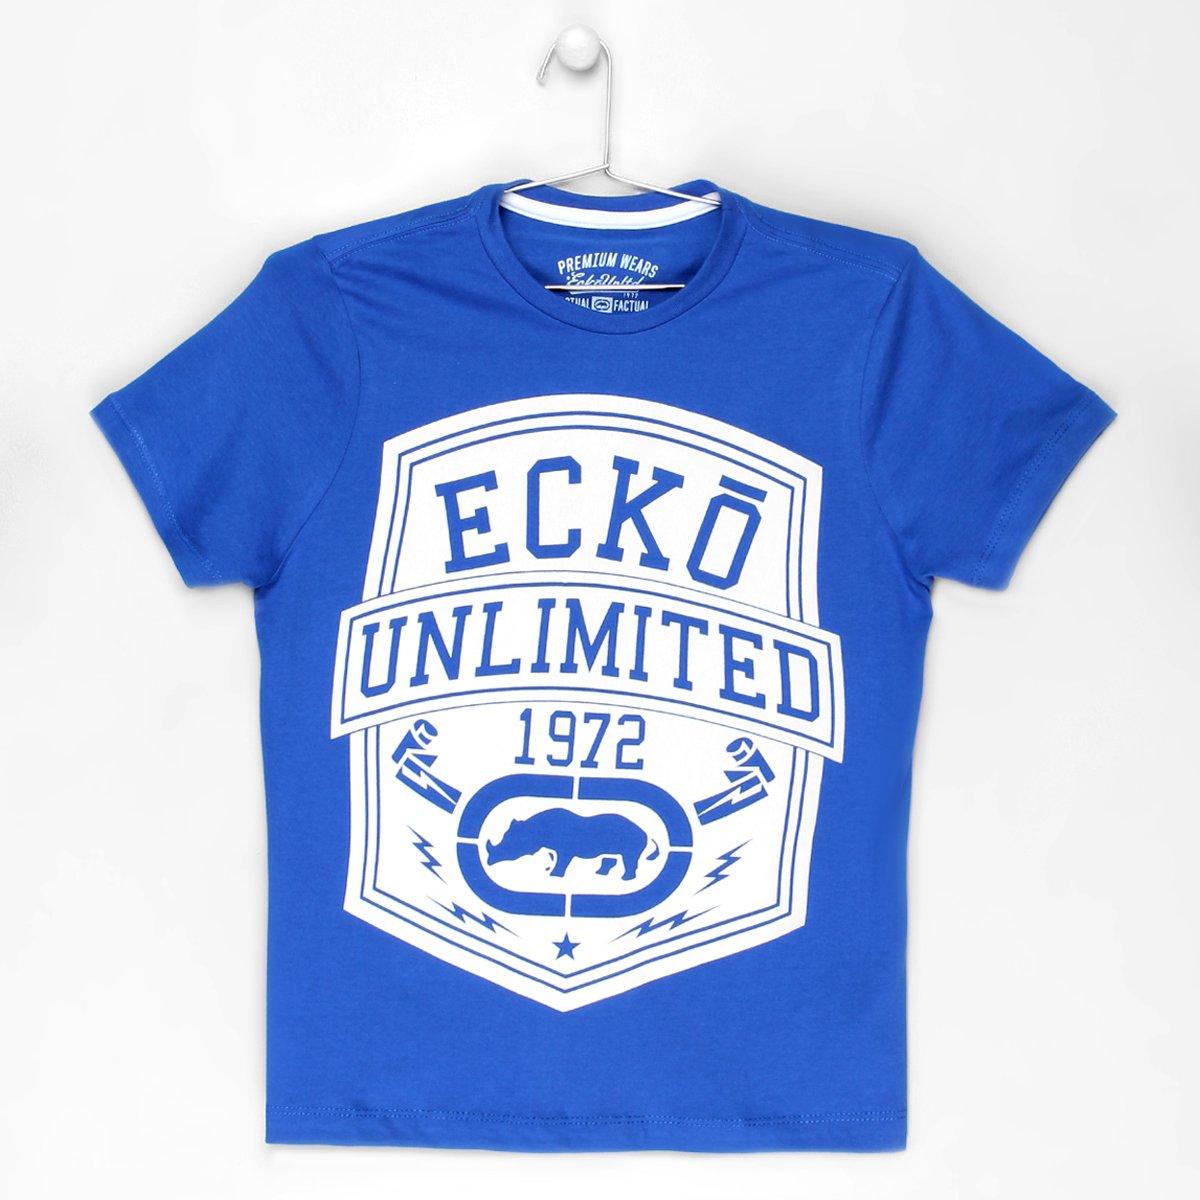 3bb4b6aa920 Camiseta Ecko Especial Infantil - Compre Agora